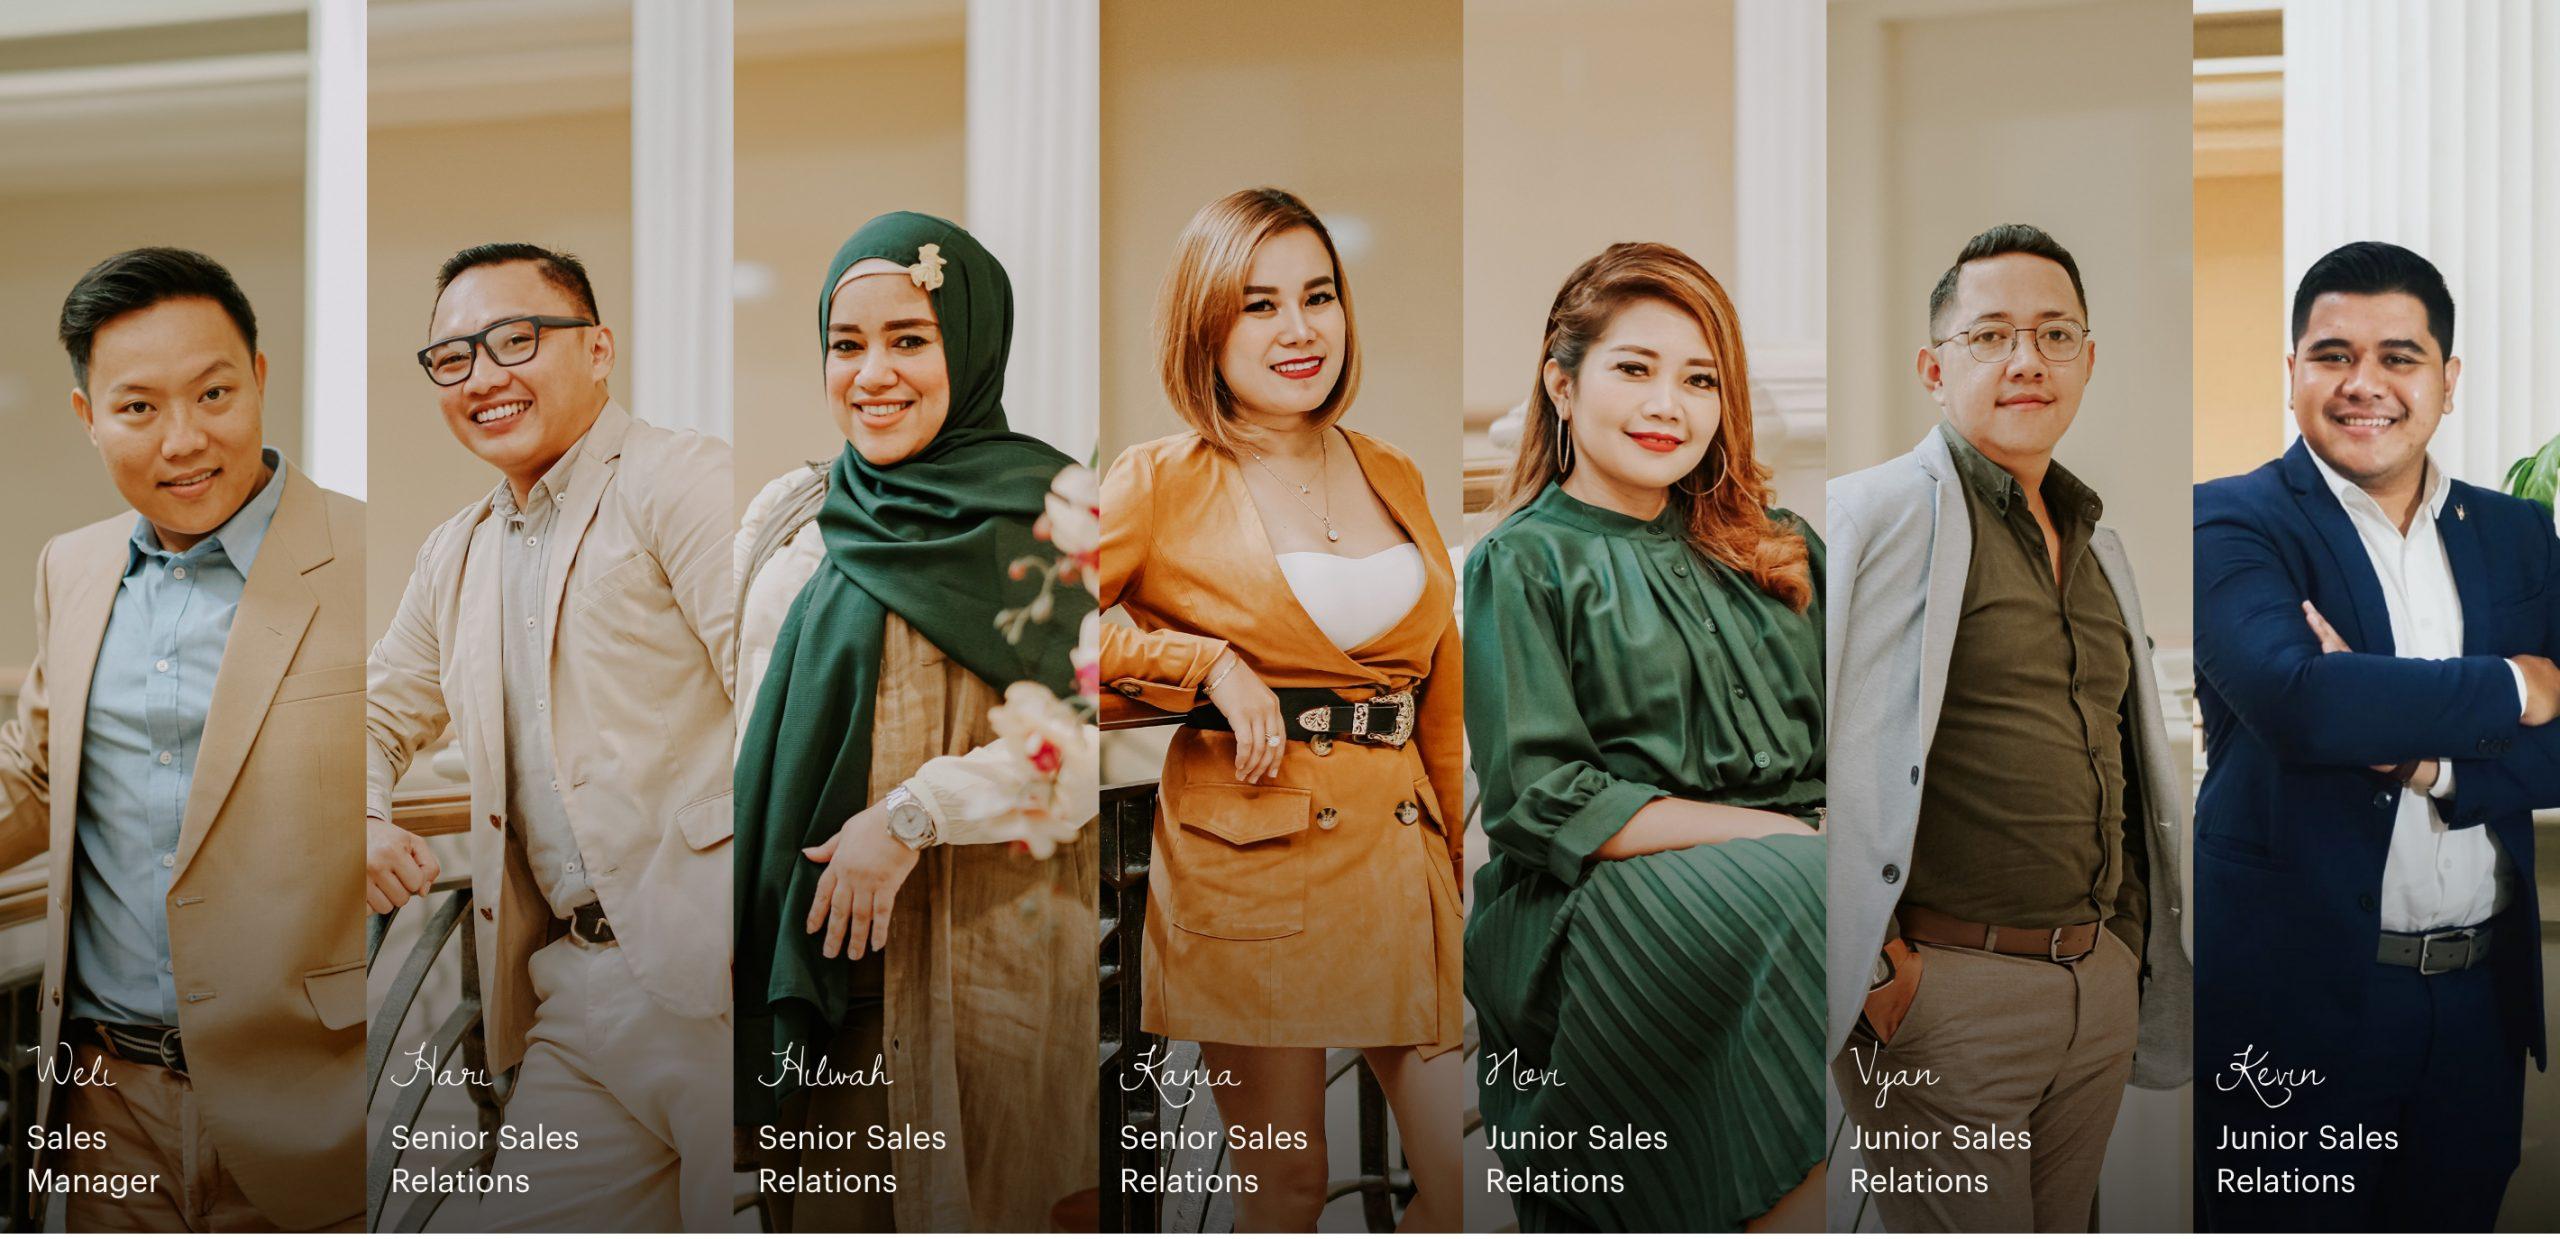 Sales Relations - Tiara Hana Indonesia